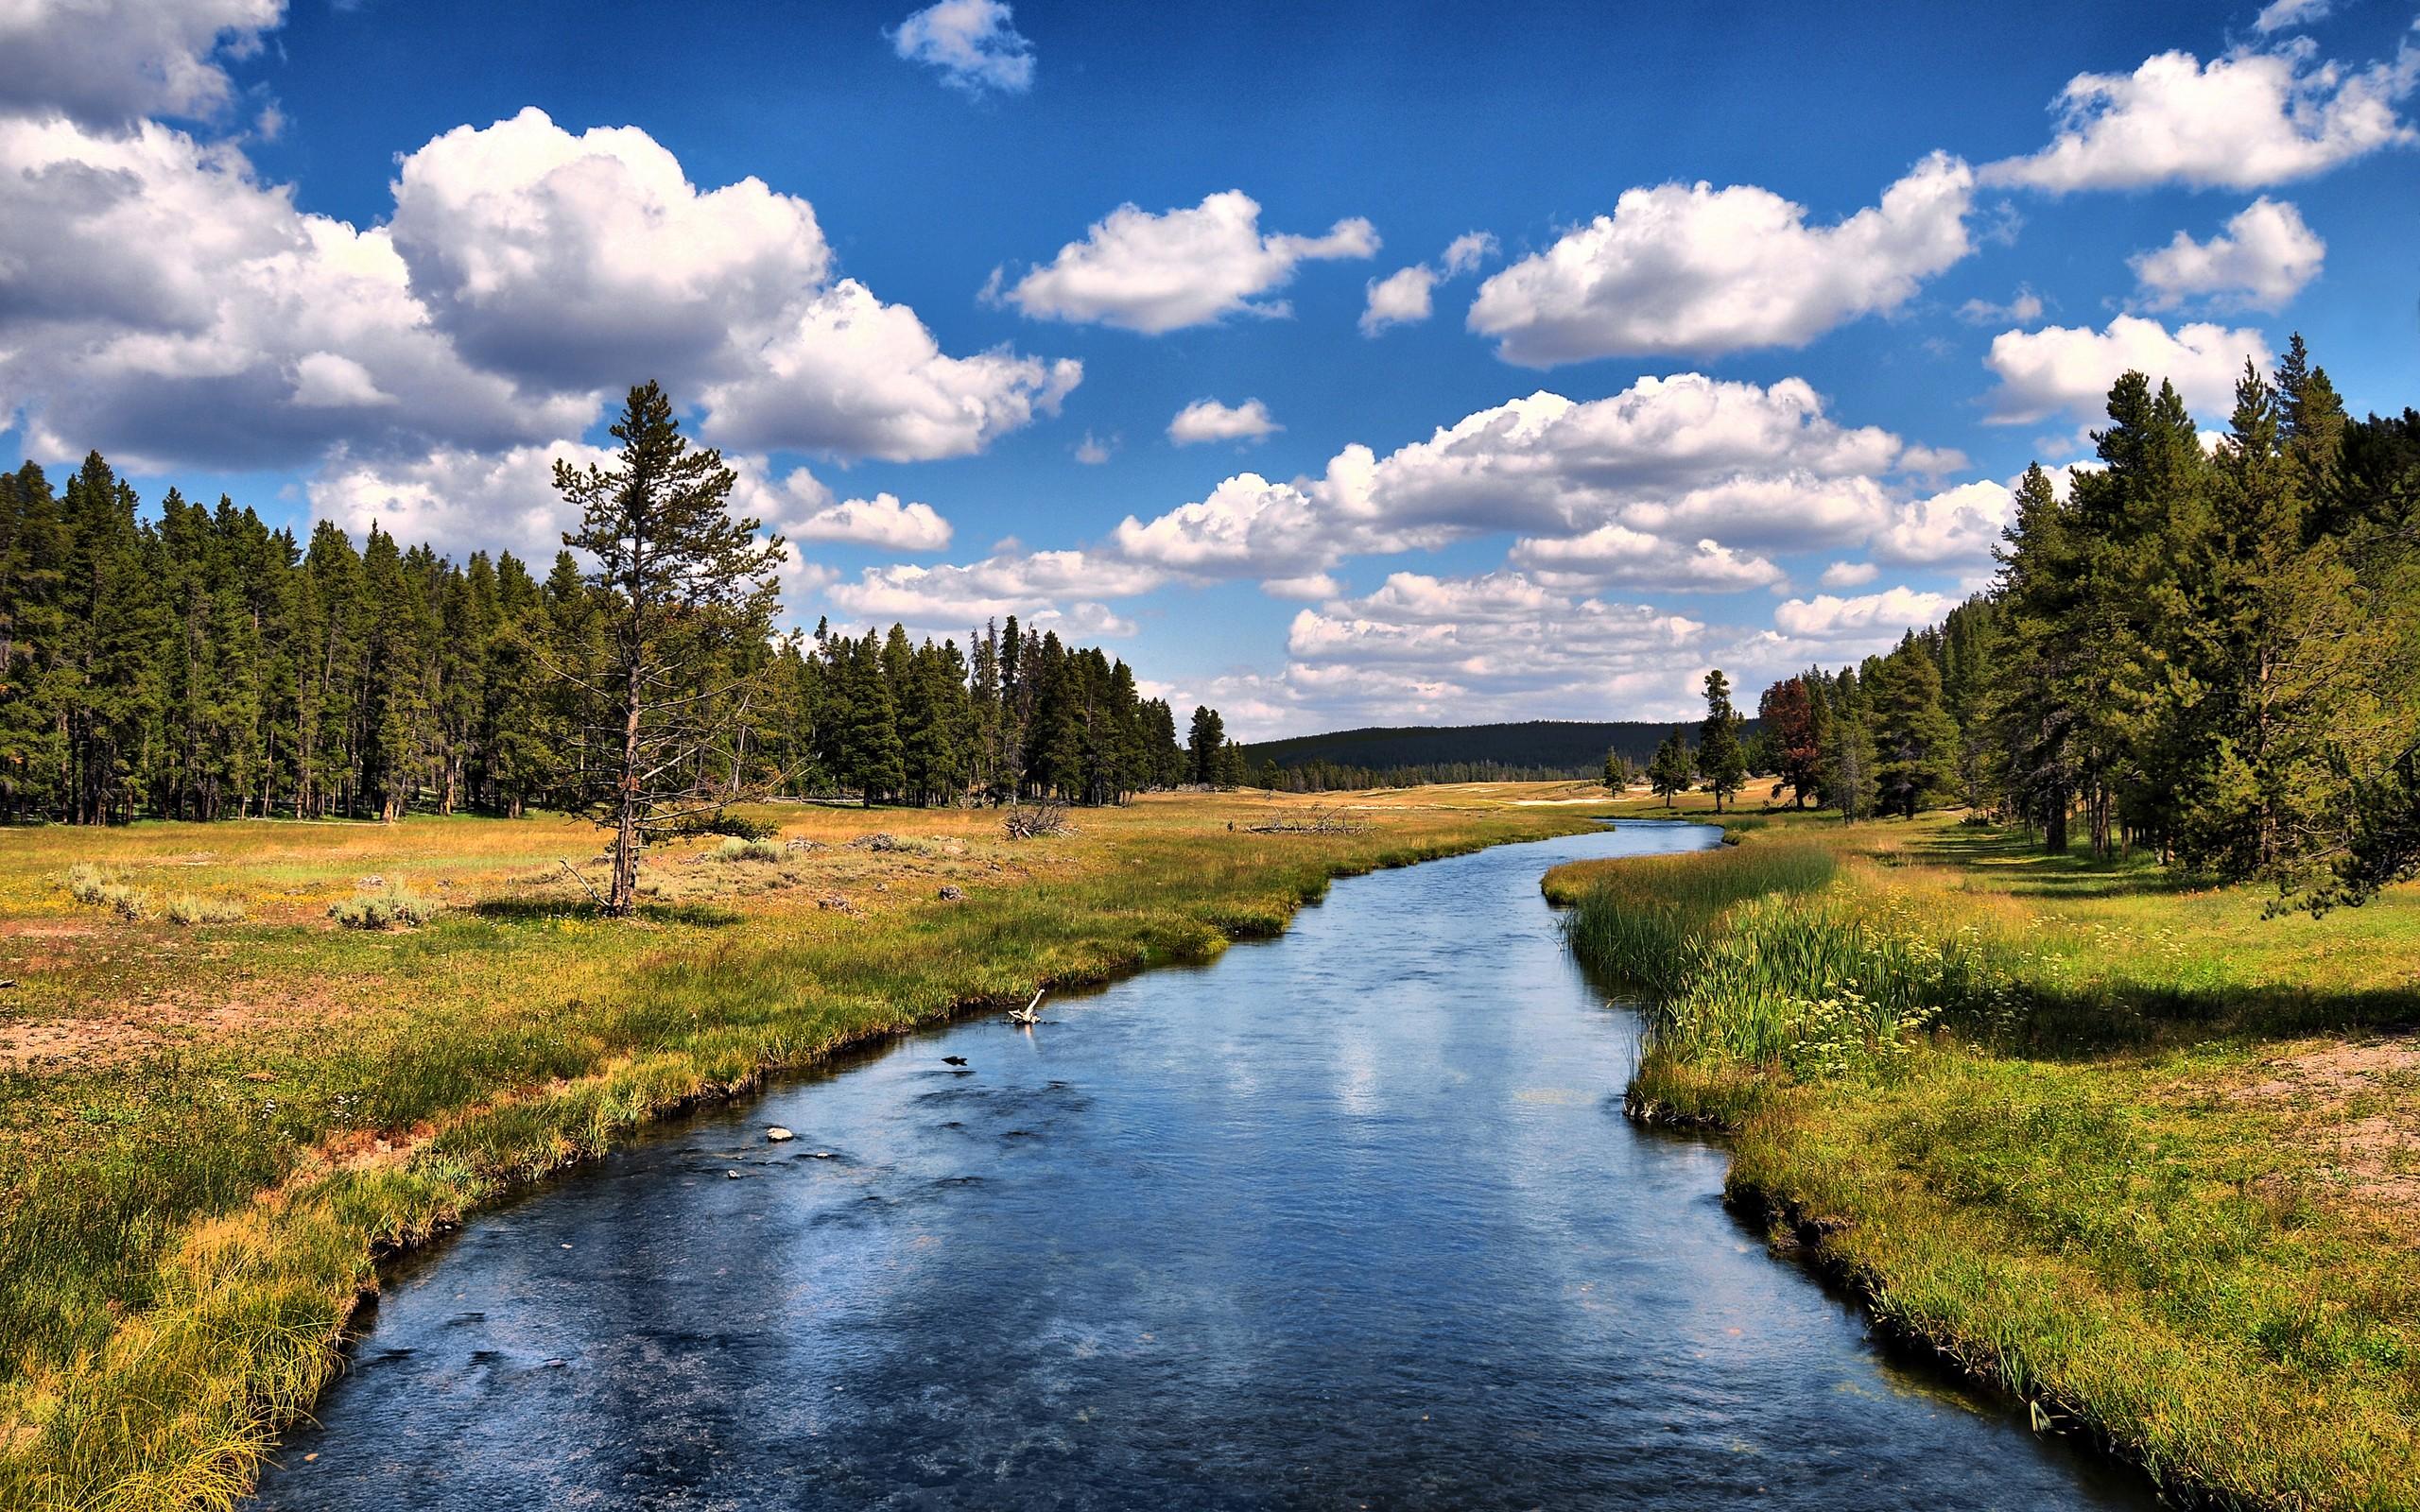 природа река деревья облака небо  № 316616 без смс